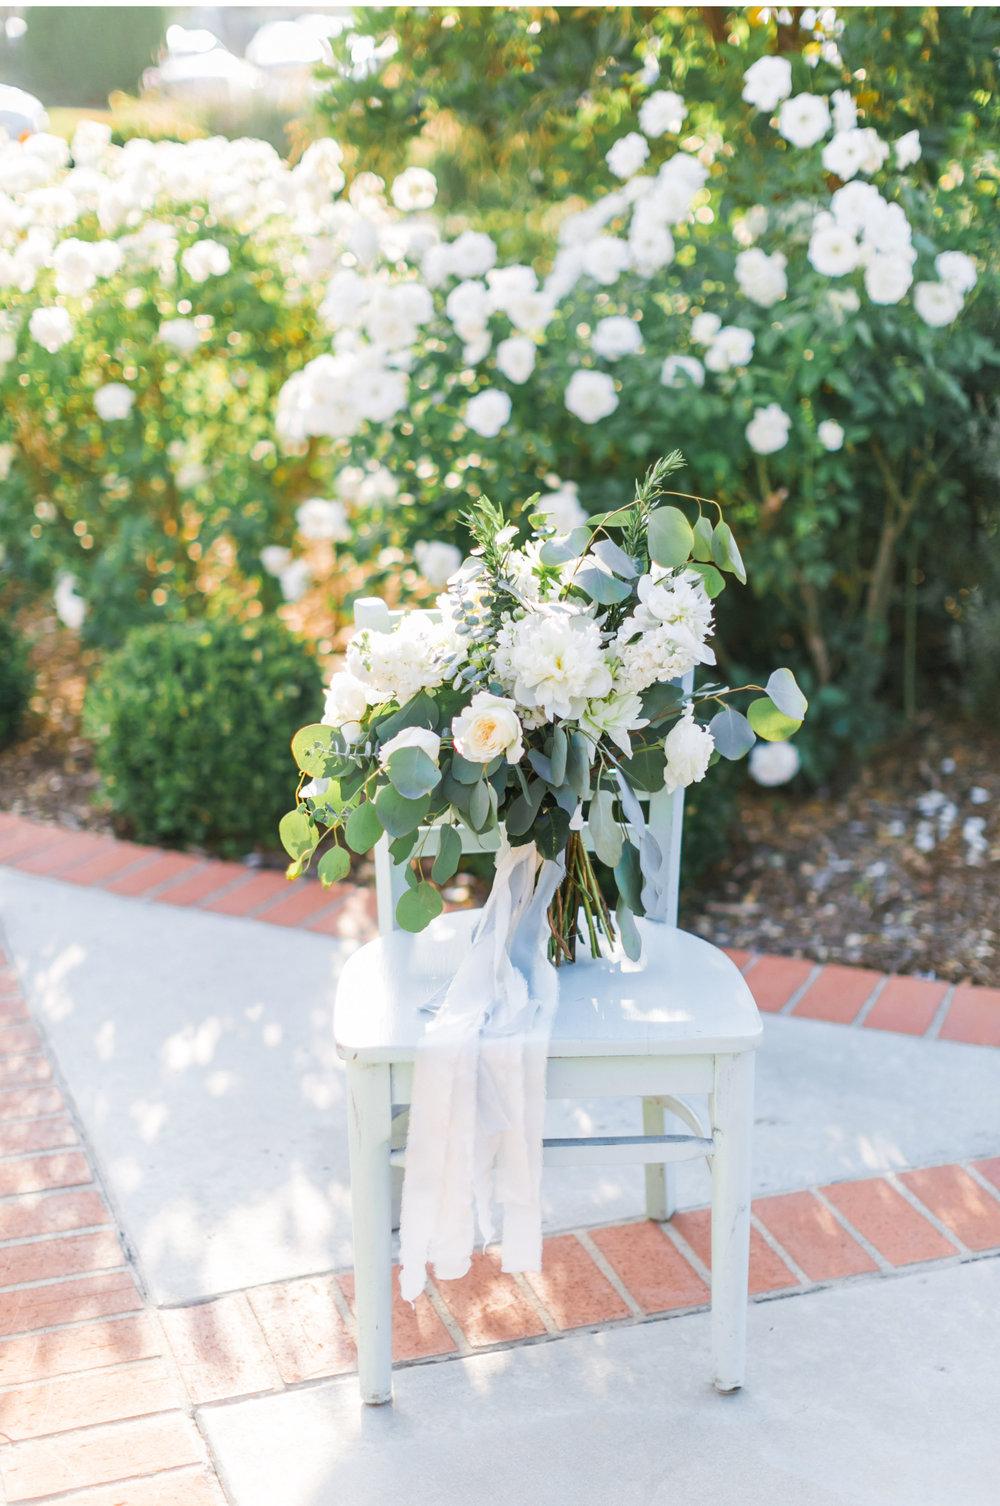 Malibu-Wedding-Photographer-Natalie-Schutt-Photography-Fine-Art-Film-Photography_11.jpg